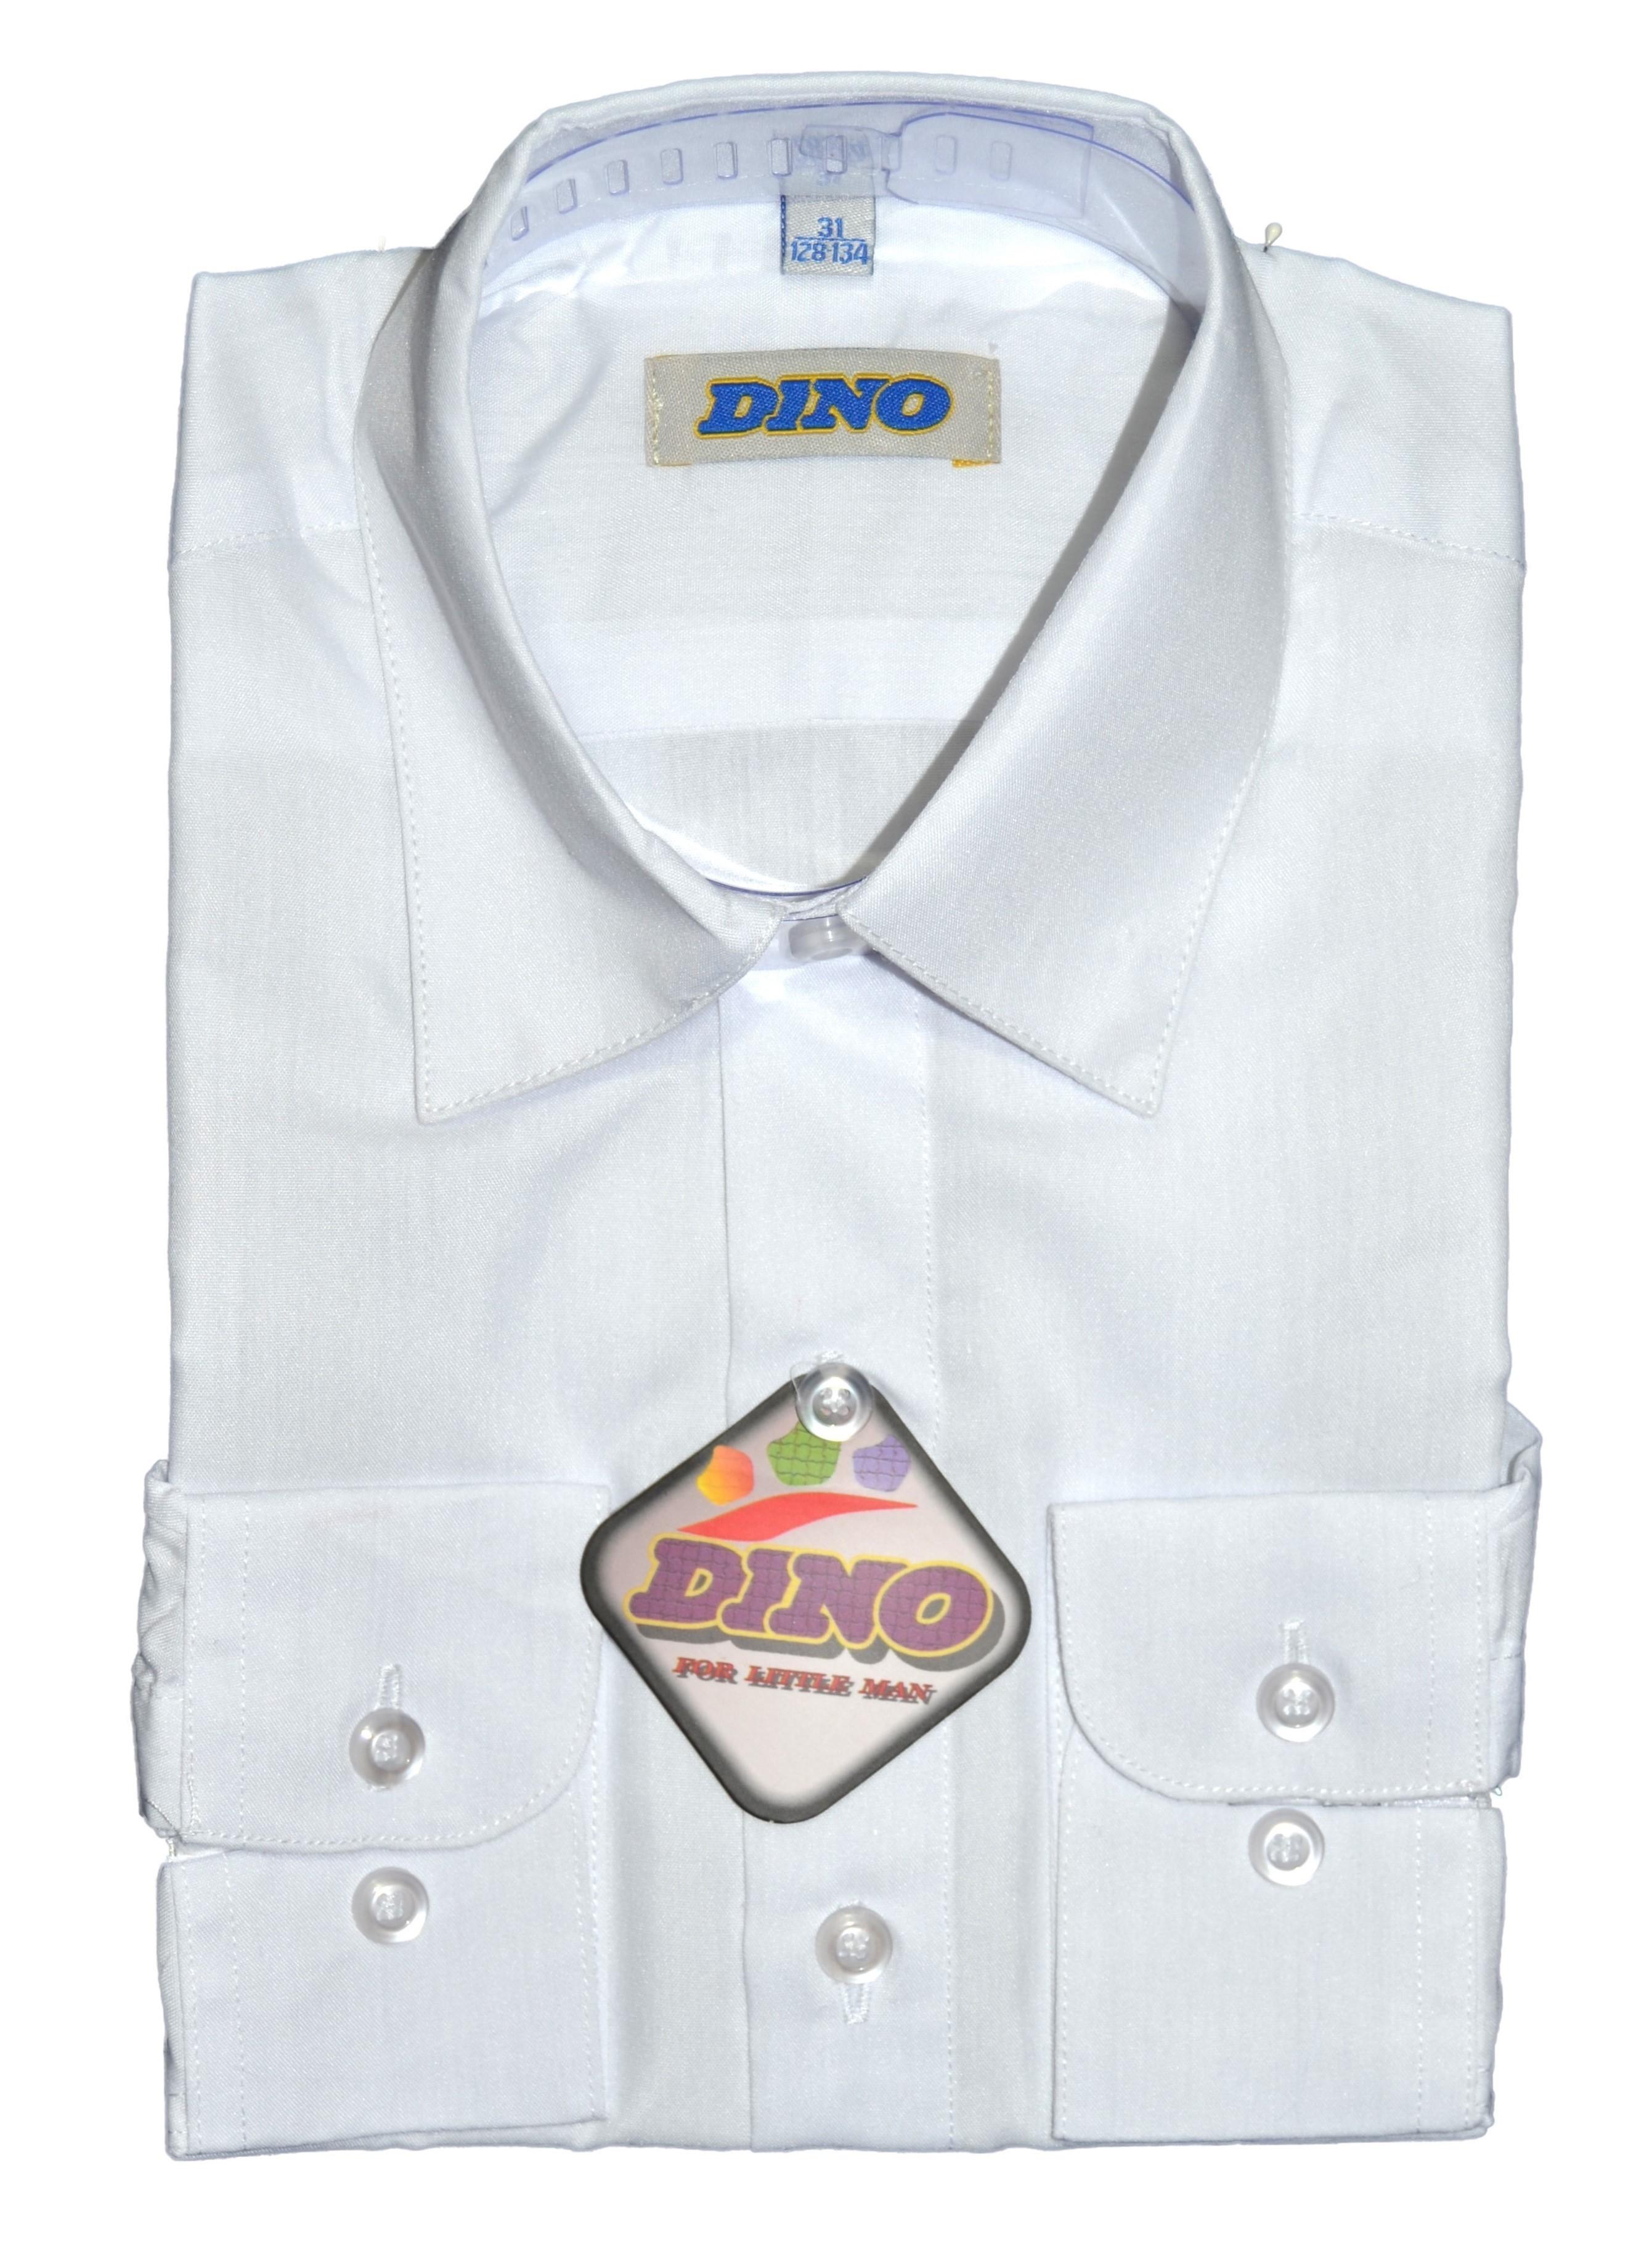 Рубашка для мальчика YS-D28бел